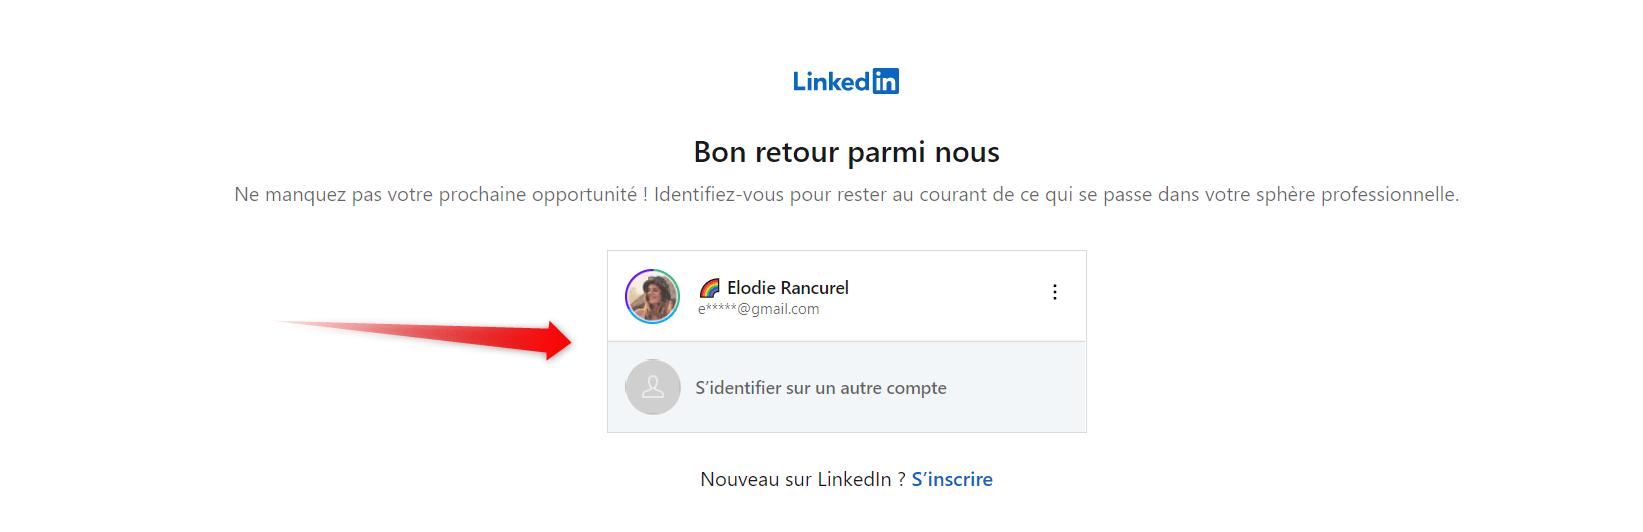 login linkedin email adresse